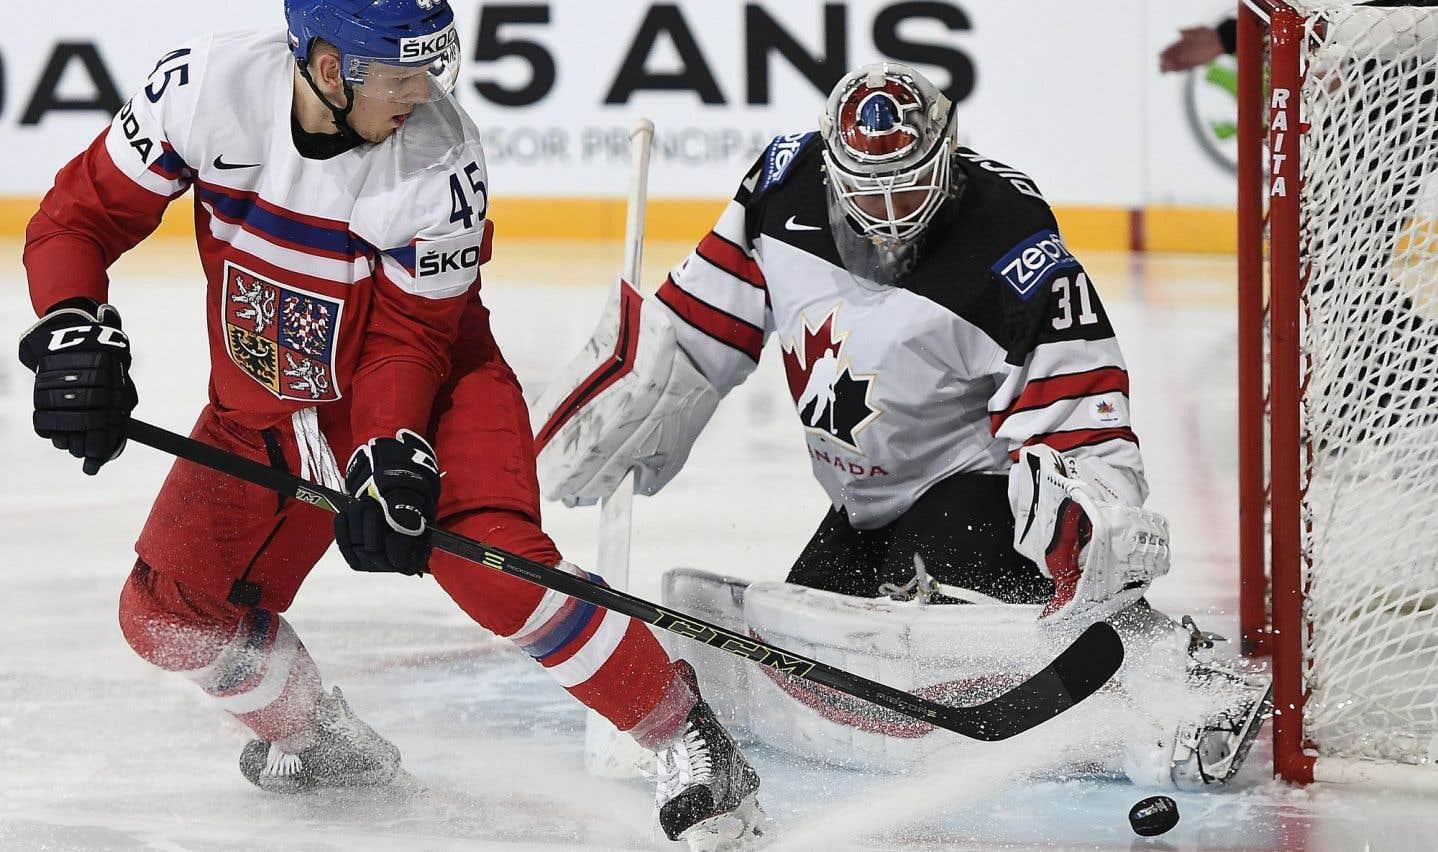 Le Canada reste invaincu au mondial de Hockey